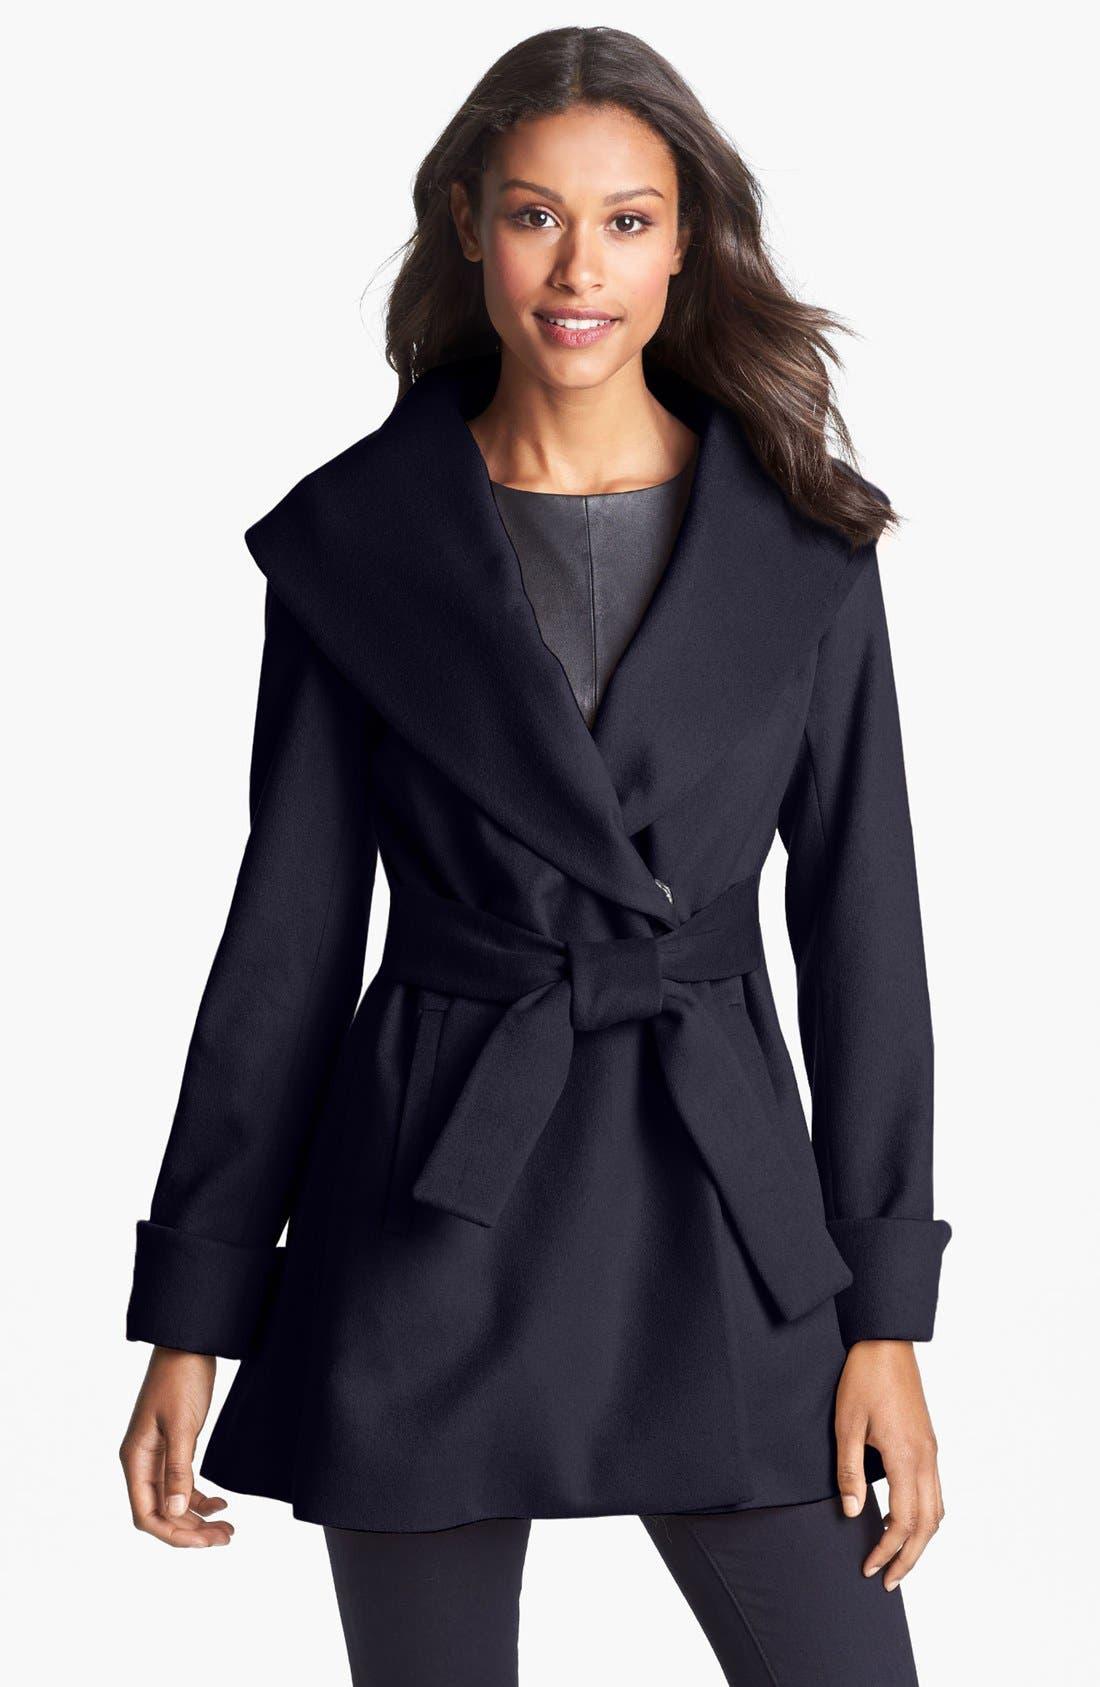 Alternate Image 1 Selected - Trina Turk Belted Wrap Coat (Regular & Petite)